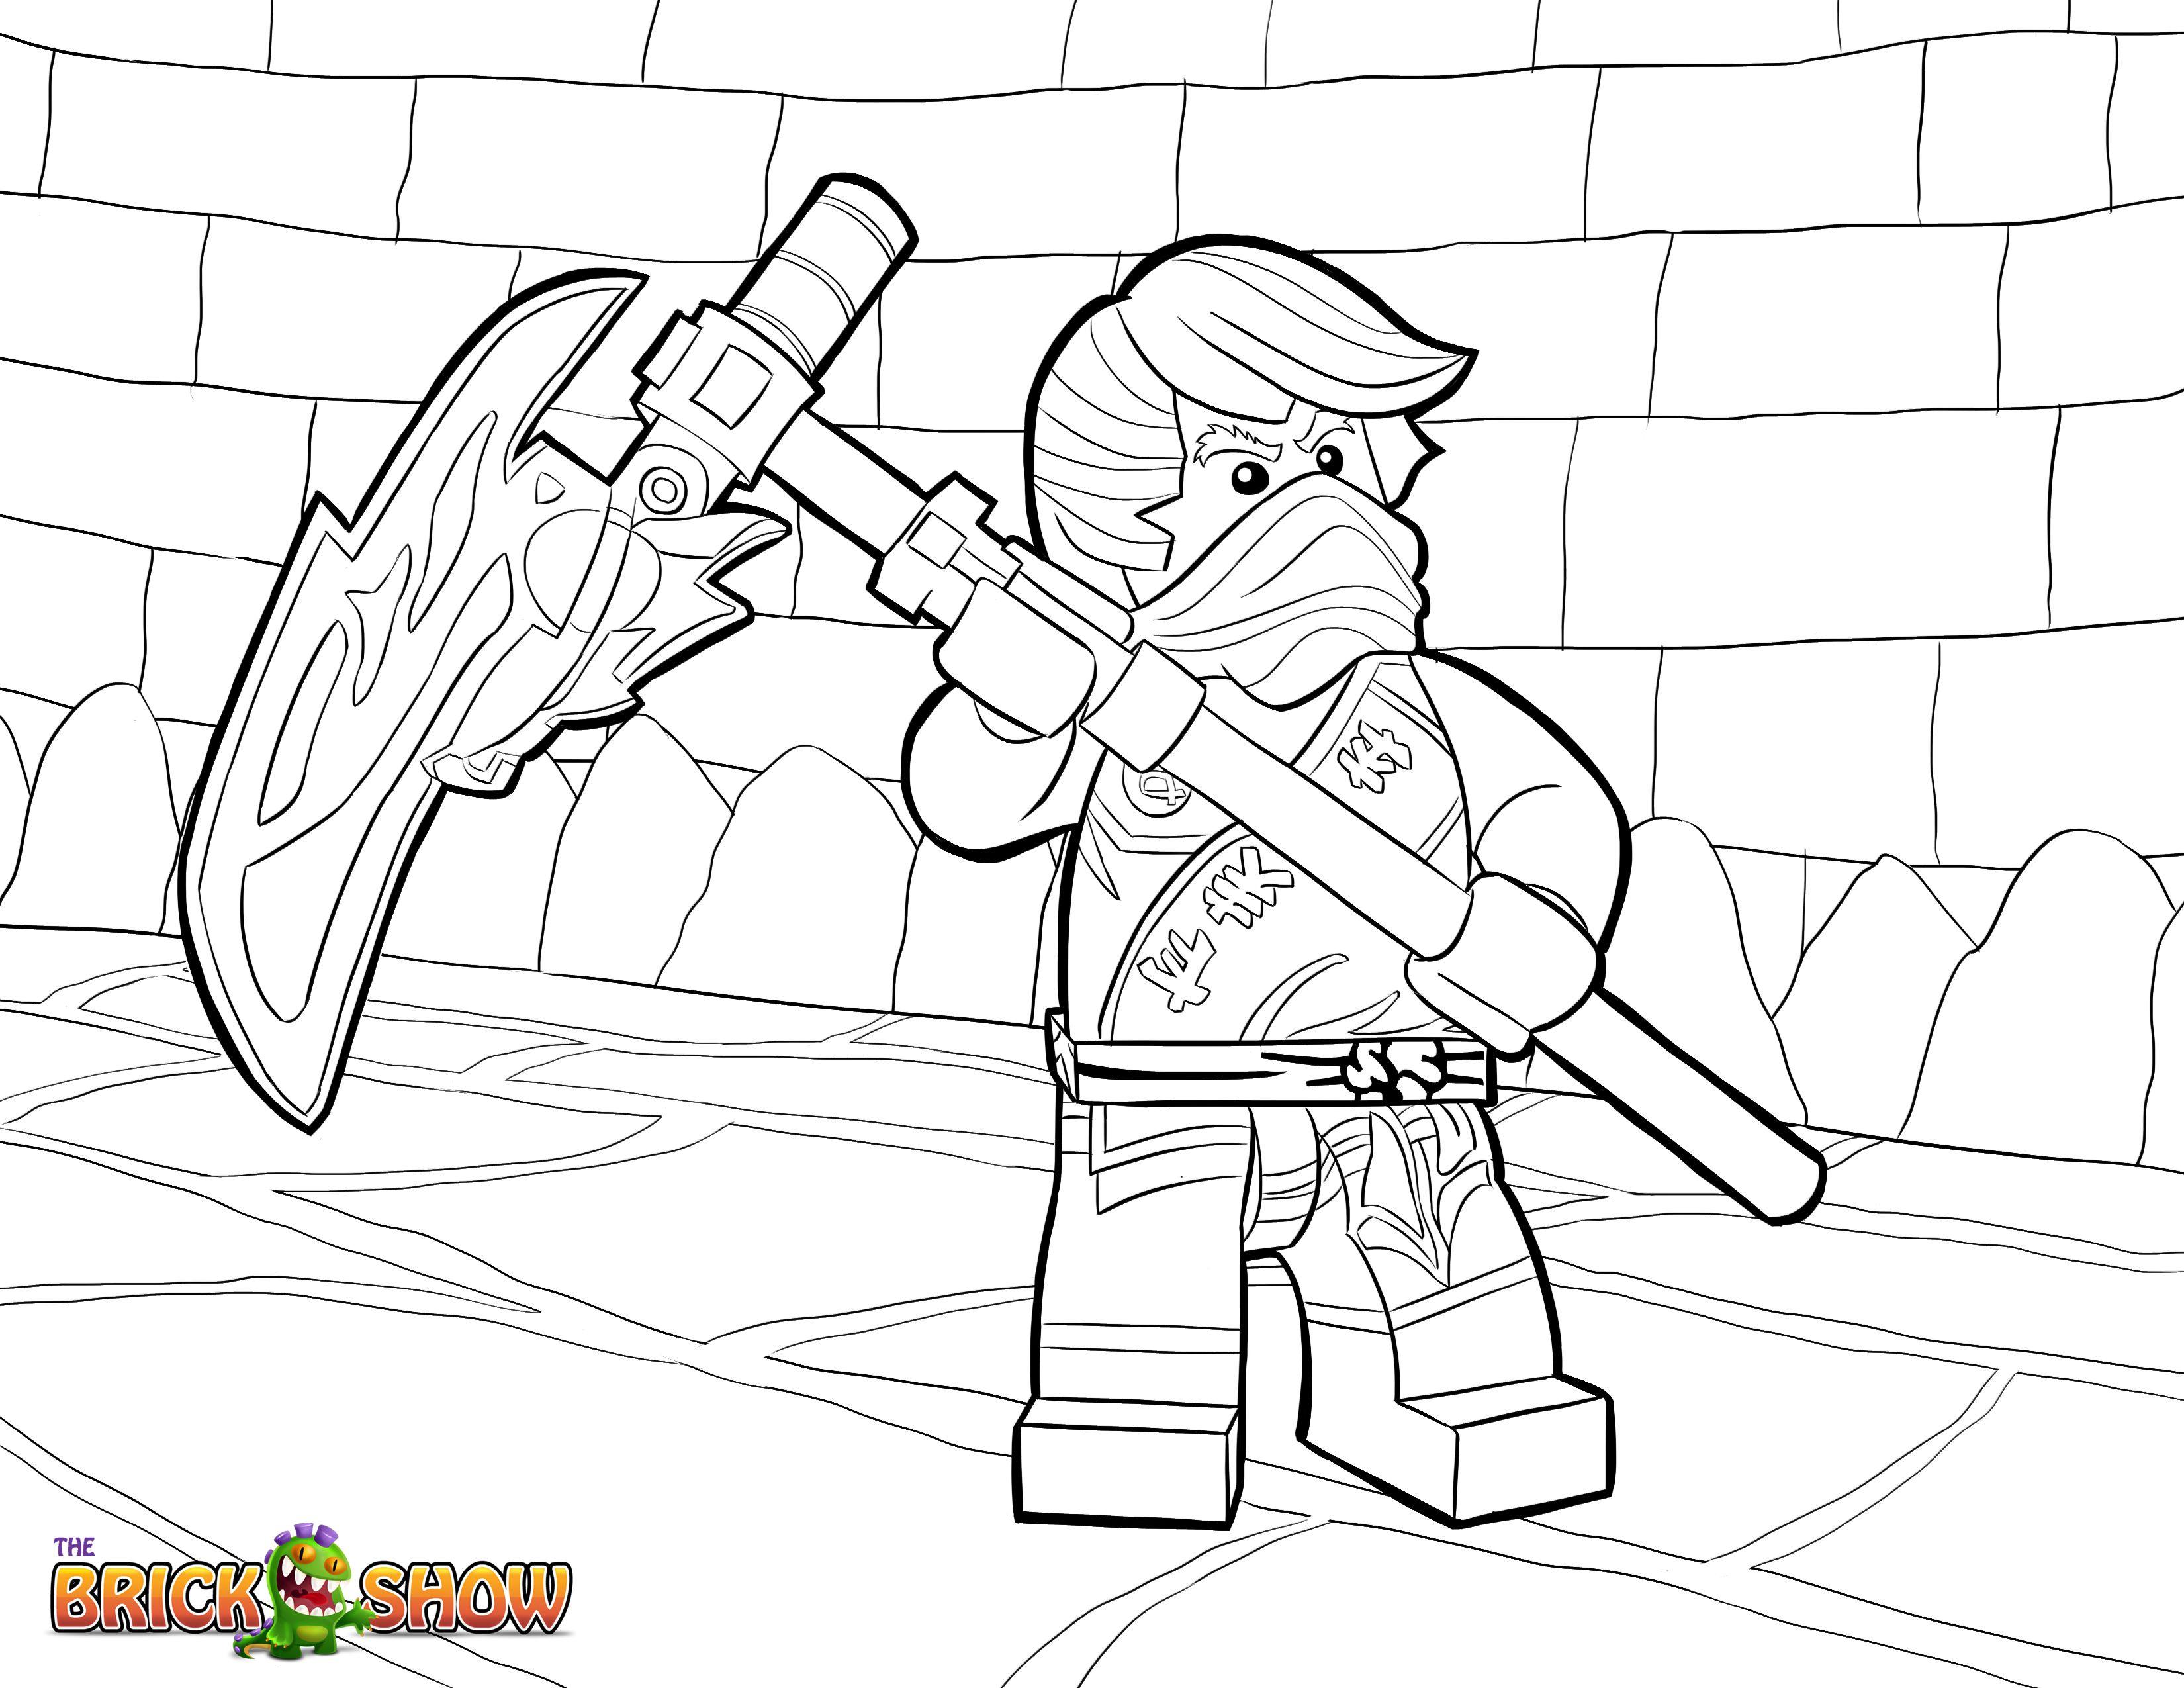 3300x2550 Lego Ninjago Coloring Page, Lego Lego Ninjago Cole Tournament